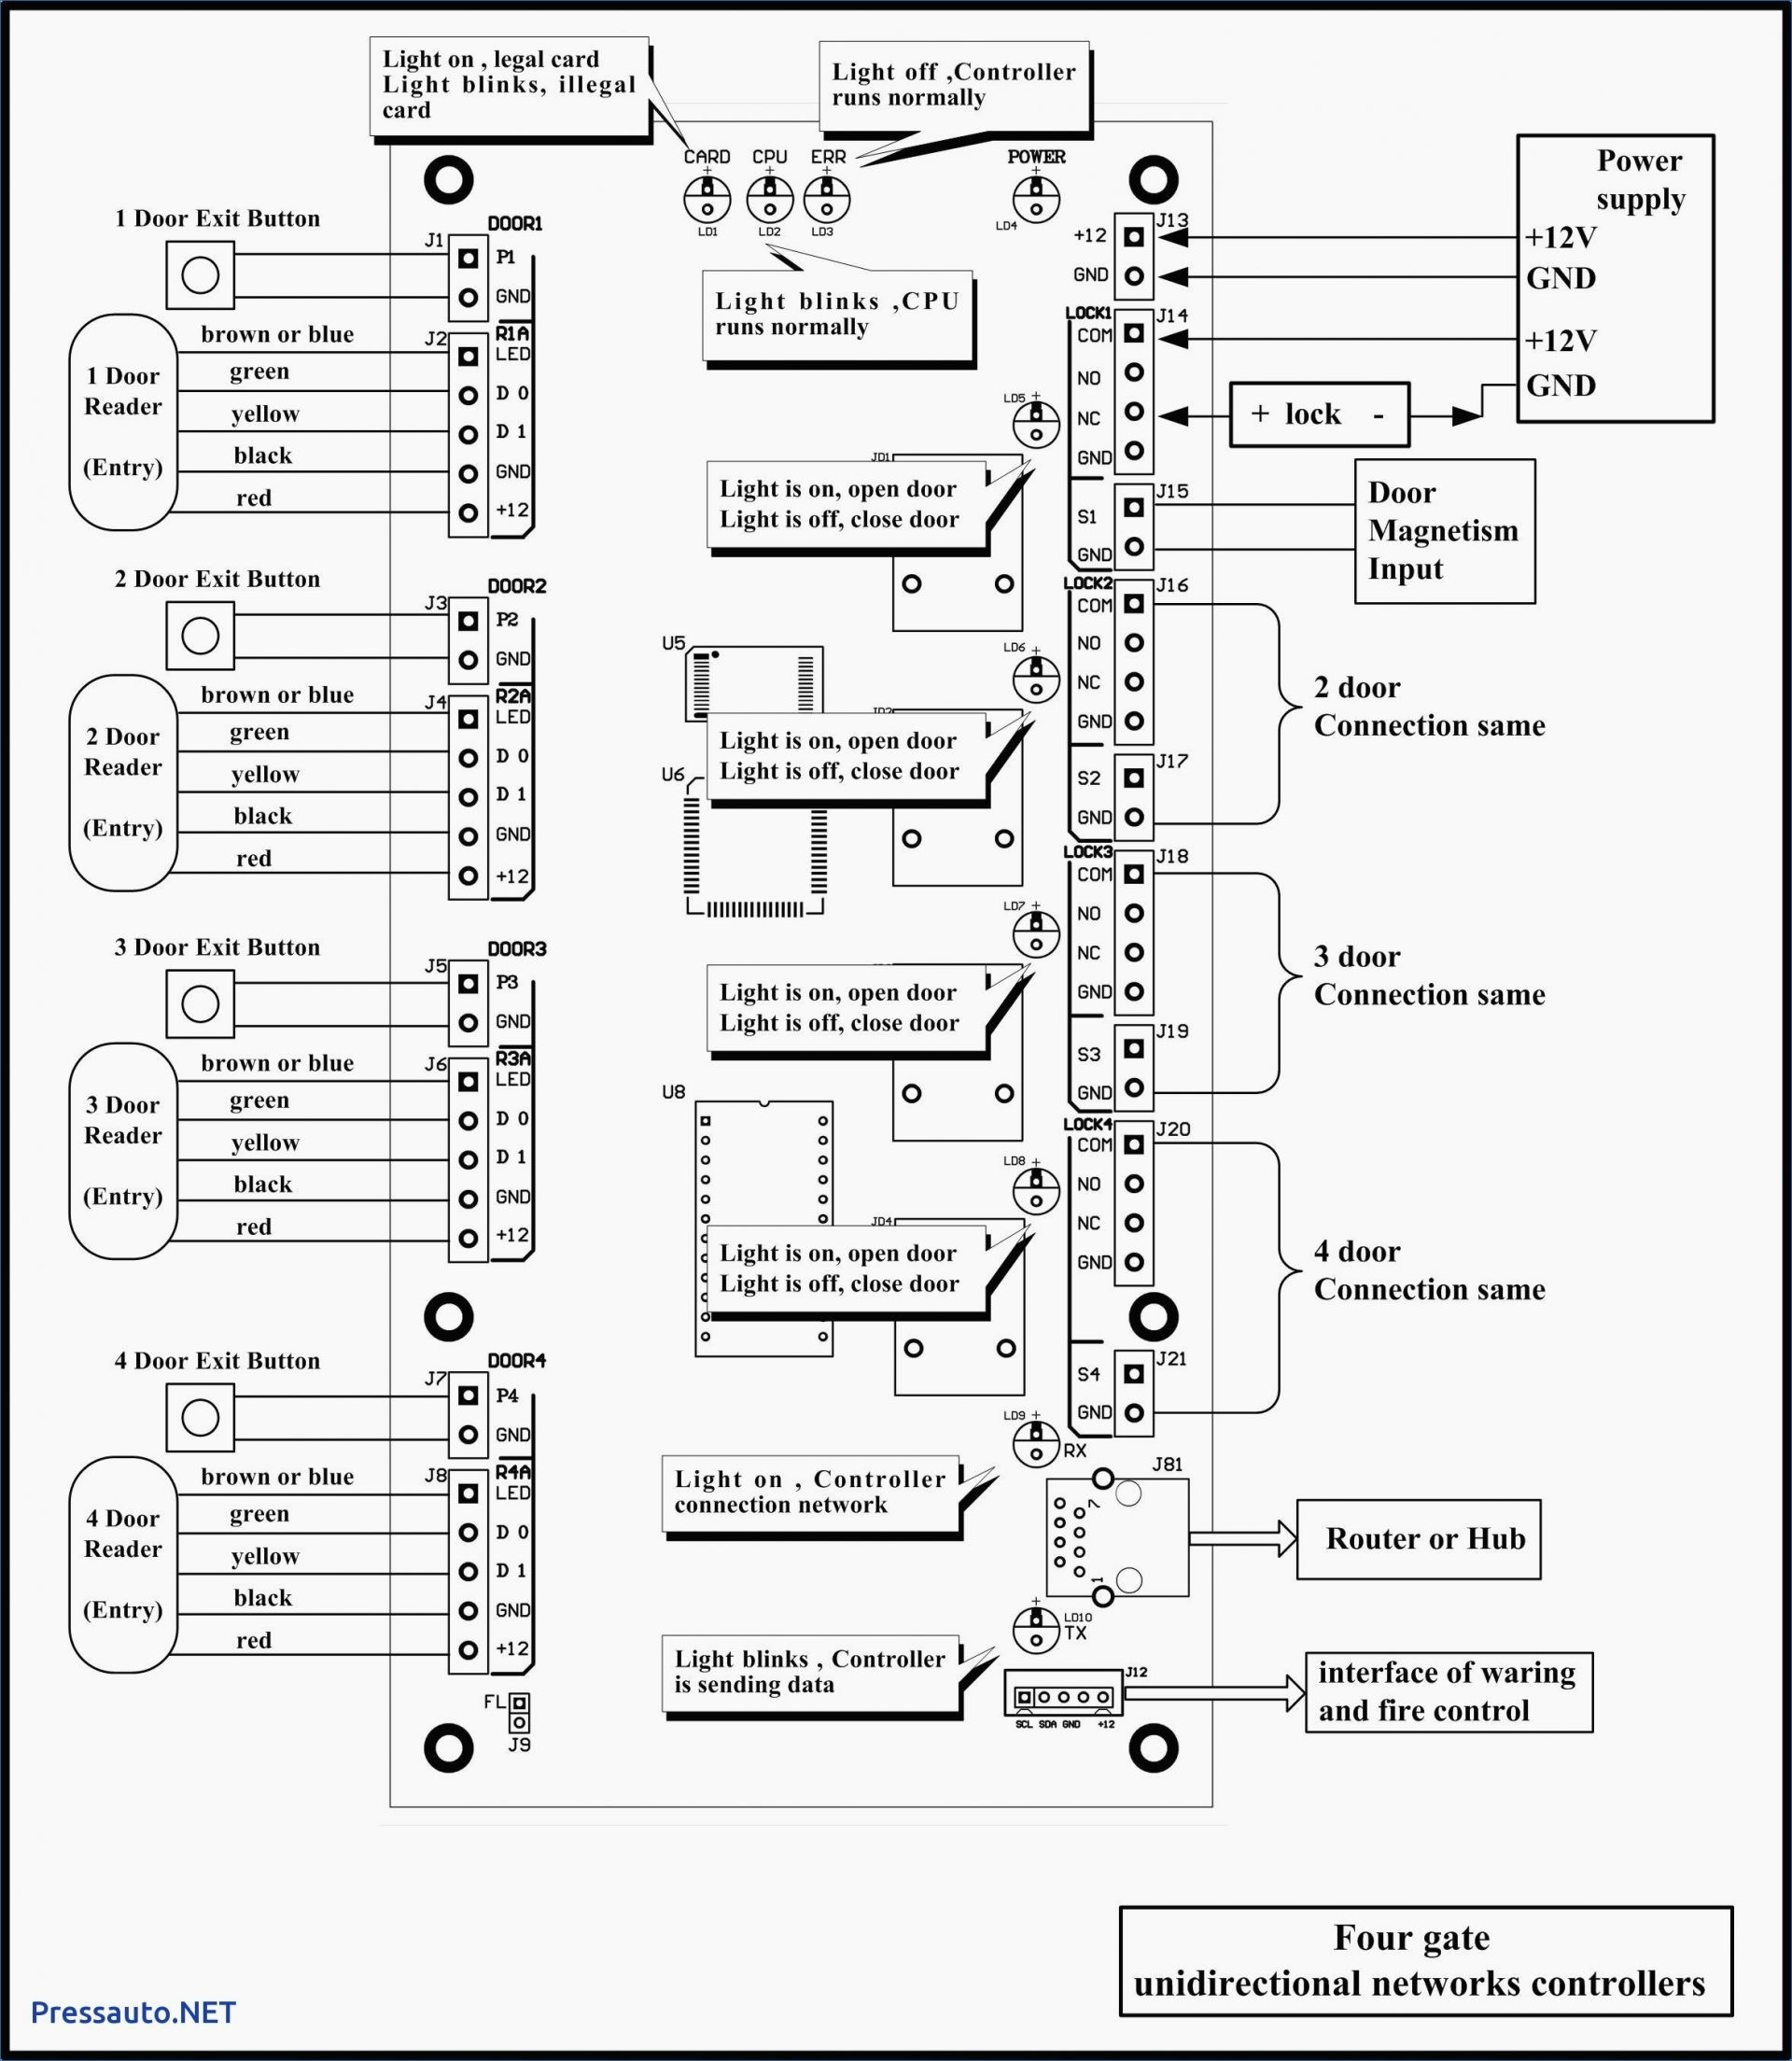 Wire Diagram Kenwood Kdc 210U - All Wiring Diagram Data - Kenwood Kdc-210U Wiring Diagram